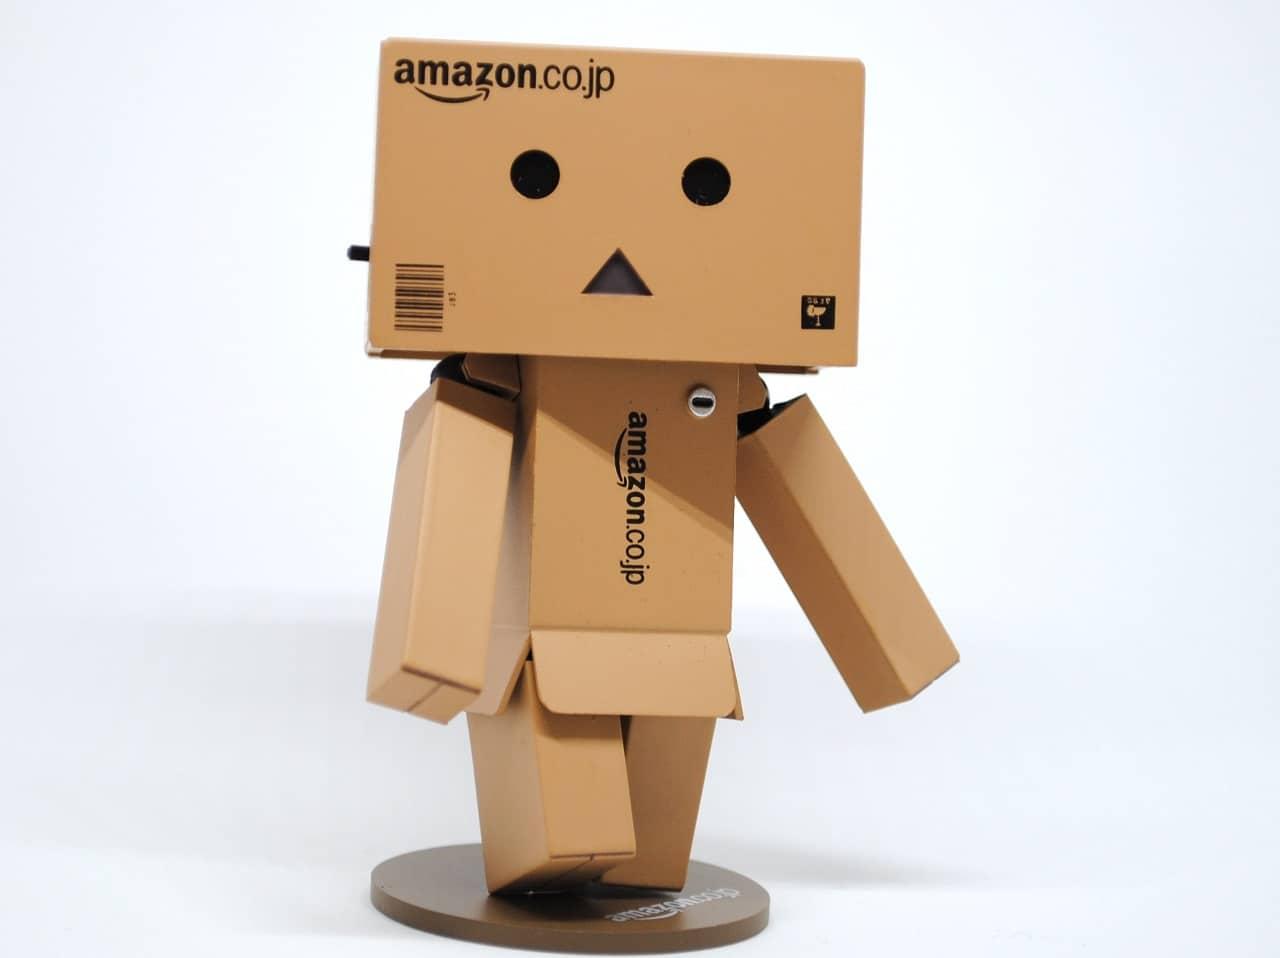 Amazonアカウント削除方法